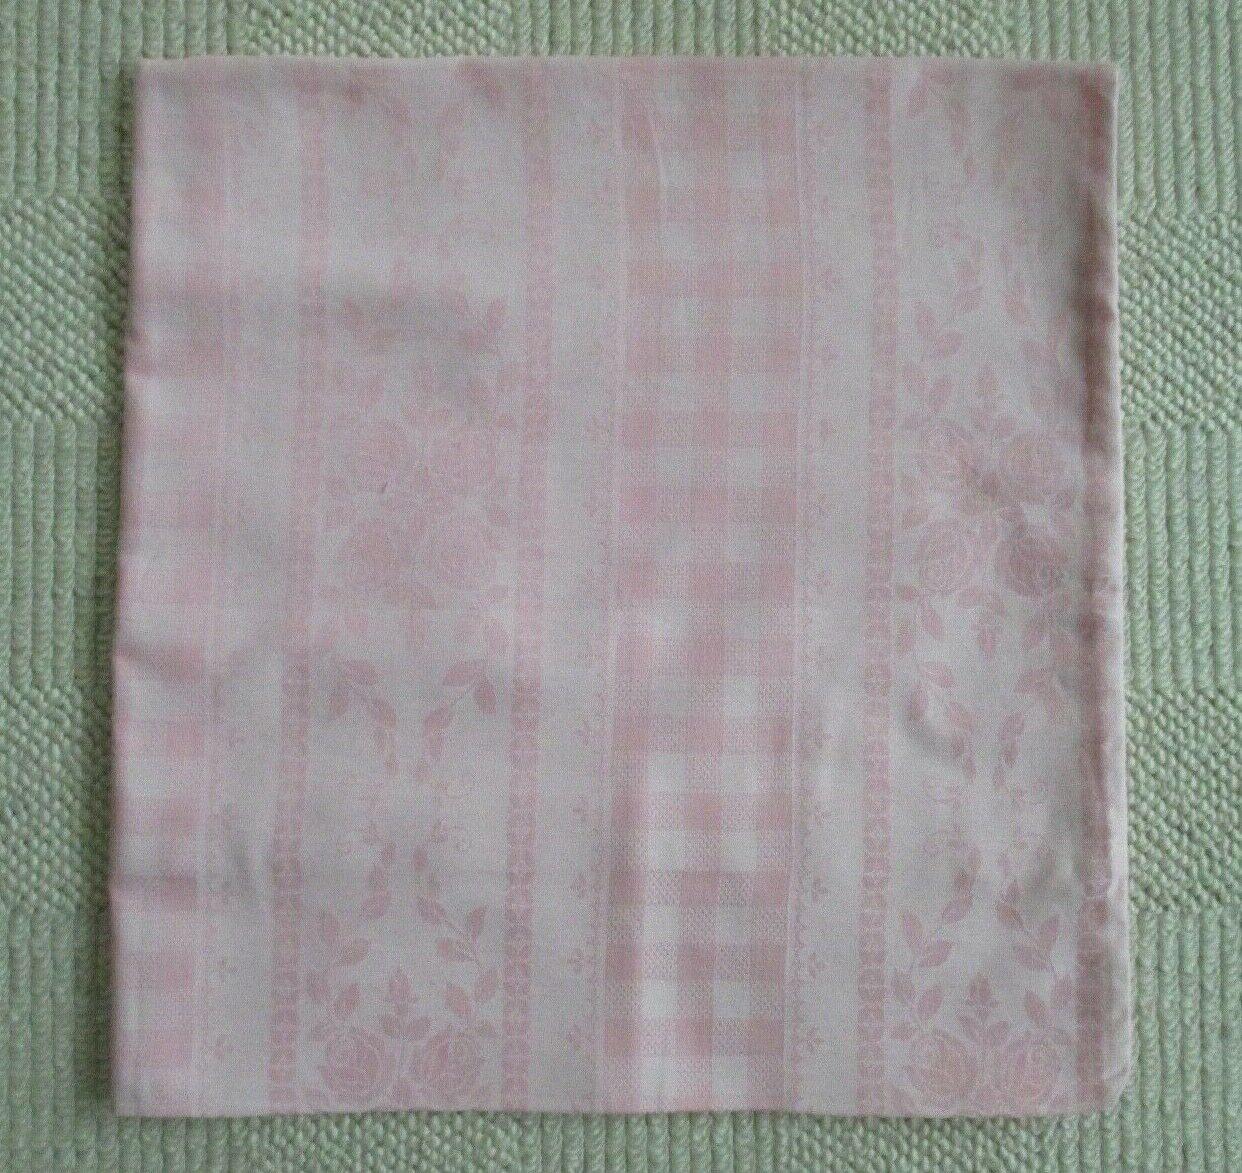 Nostalgischer rosa Kissenbezug 100 % BW Babybett Kinderwagen ca. 80x80 cm